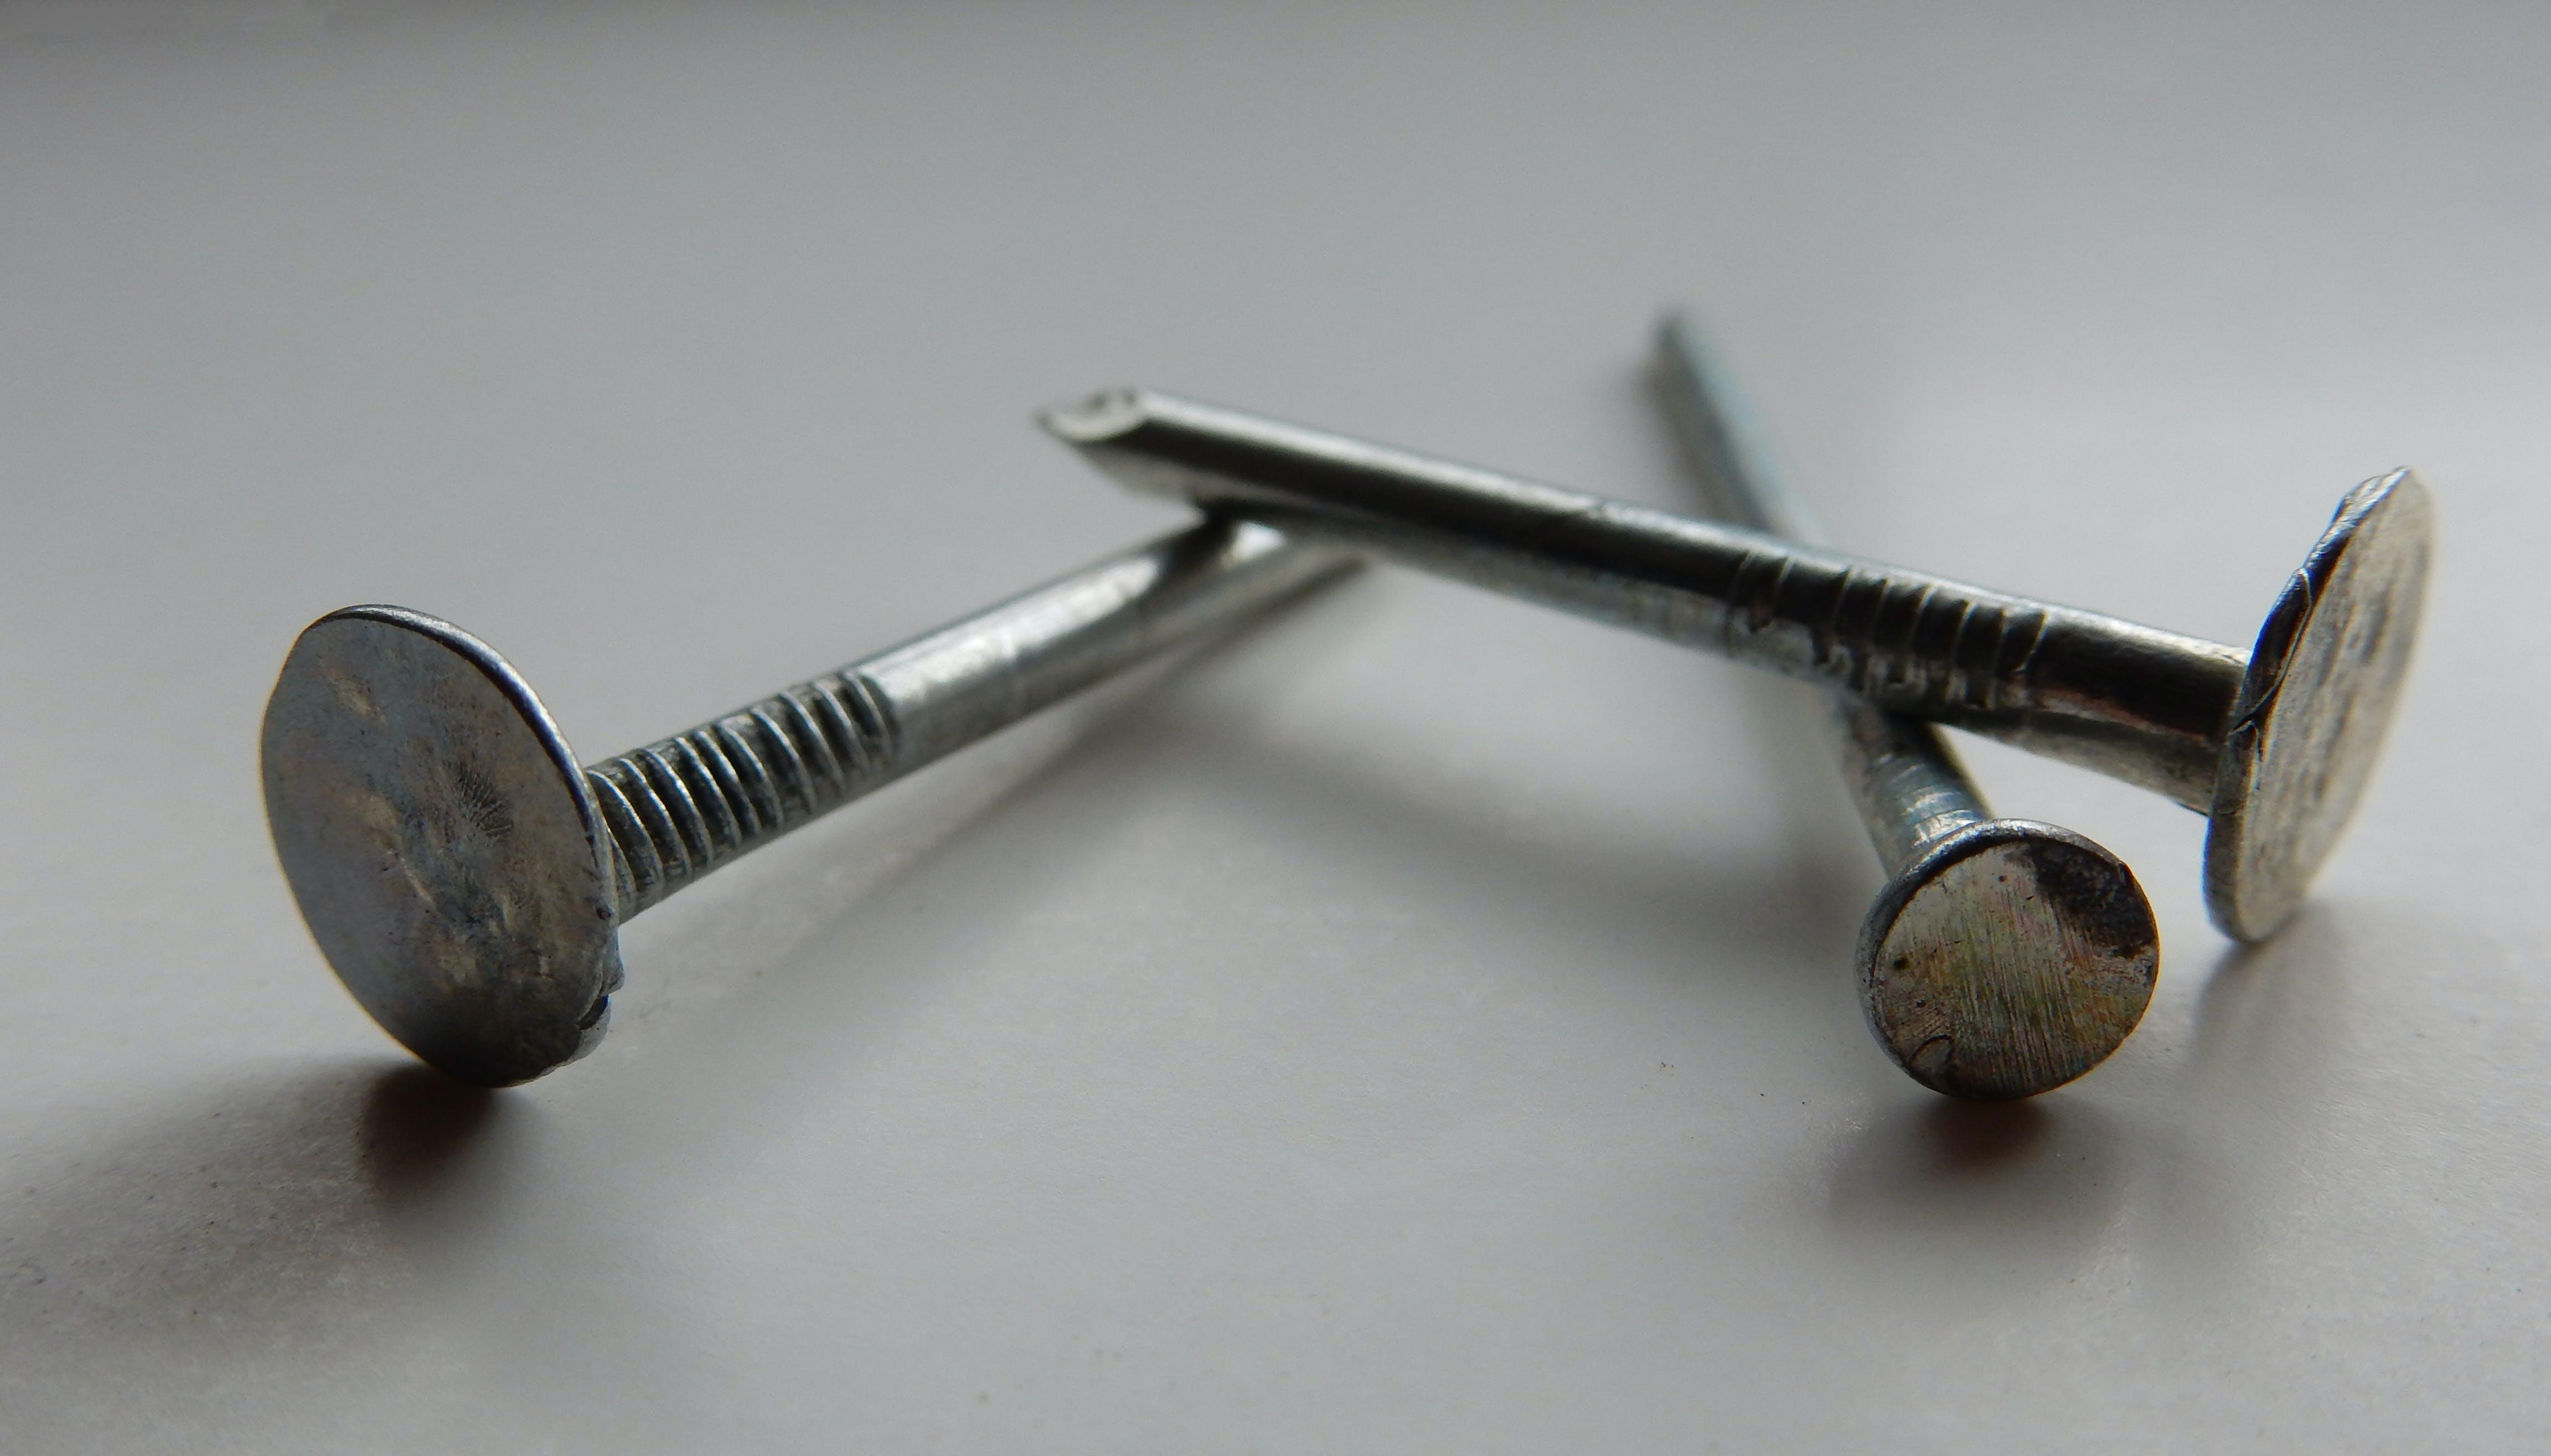 3 Flat Head Nails Close Up Photography